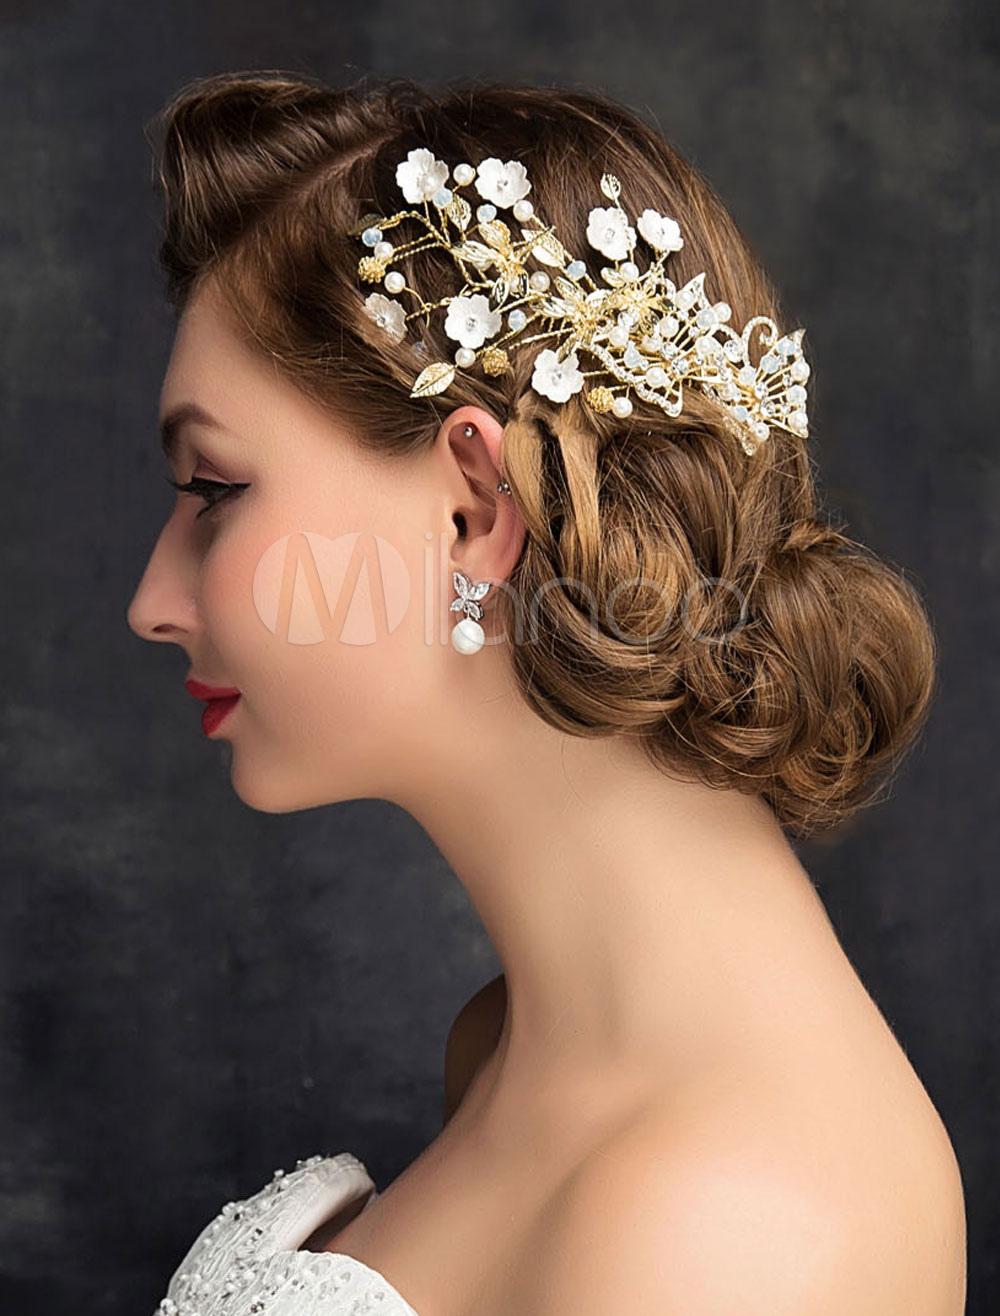 Buy Wedding Hair Accessories Comb Rhinestones Imitation Pearls Alloy Bridal Headpiece for $15.99 in Milanoo store